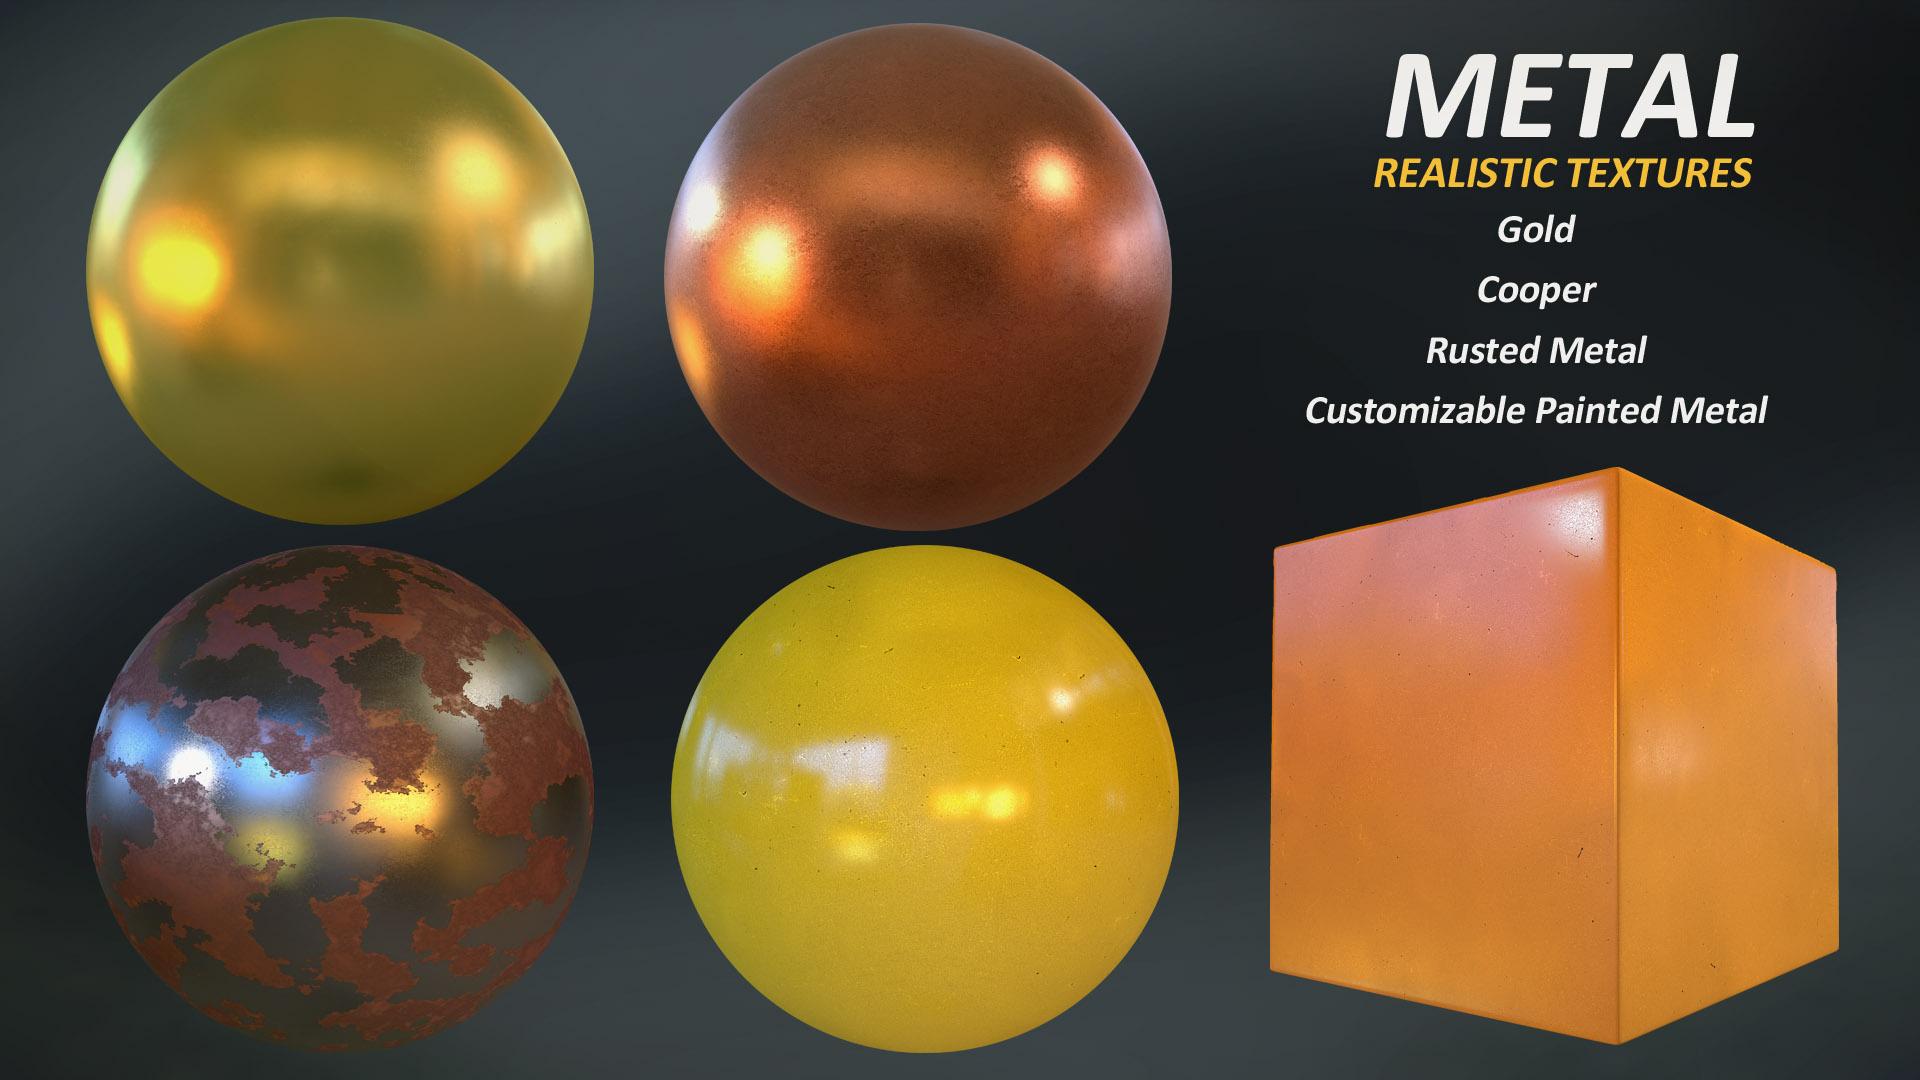 metal_realistic_textures_01.jpg